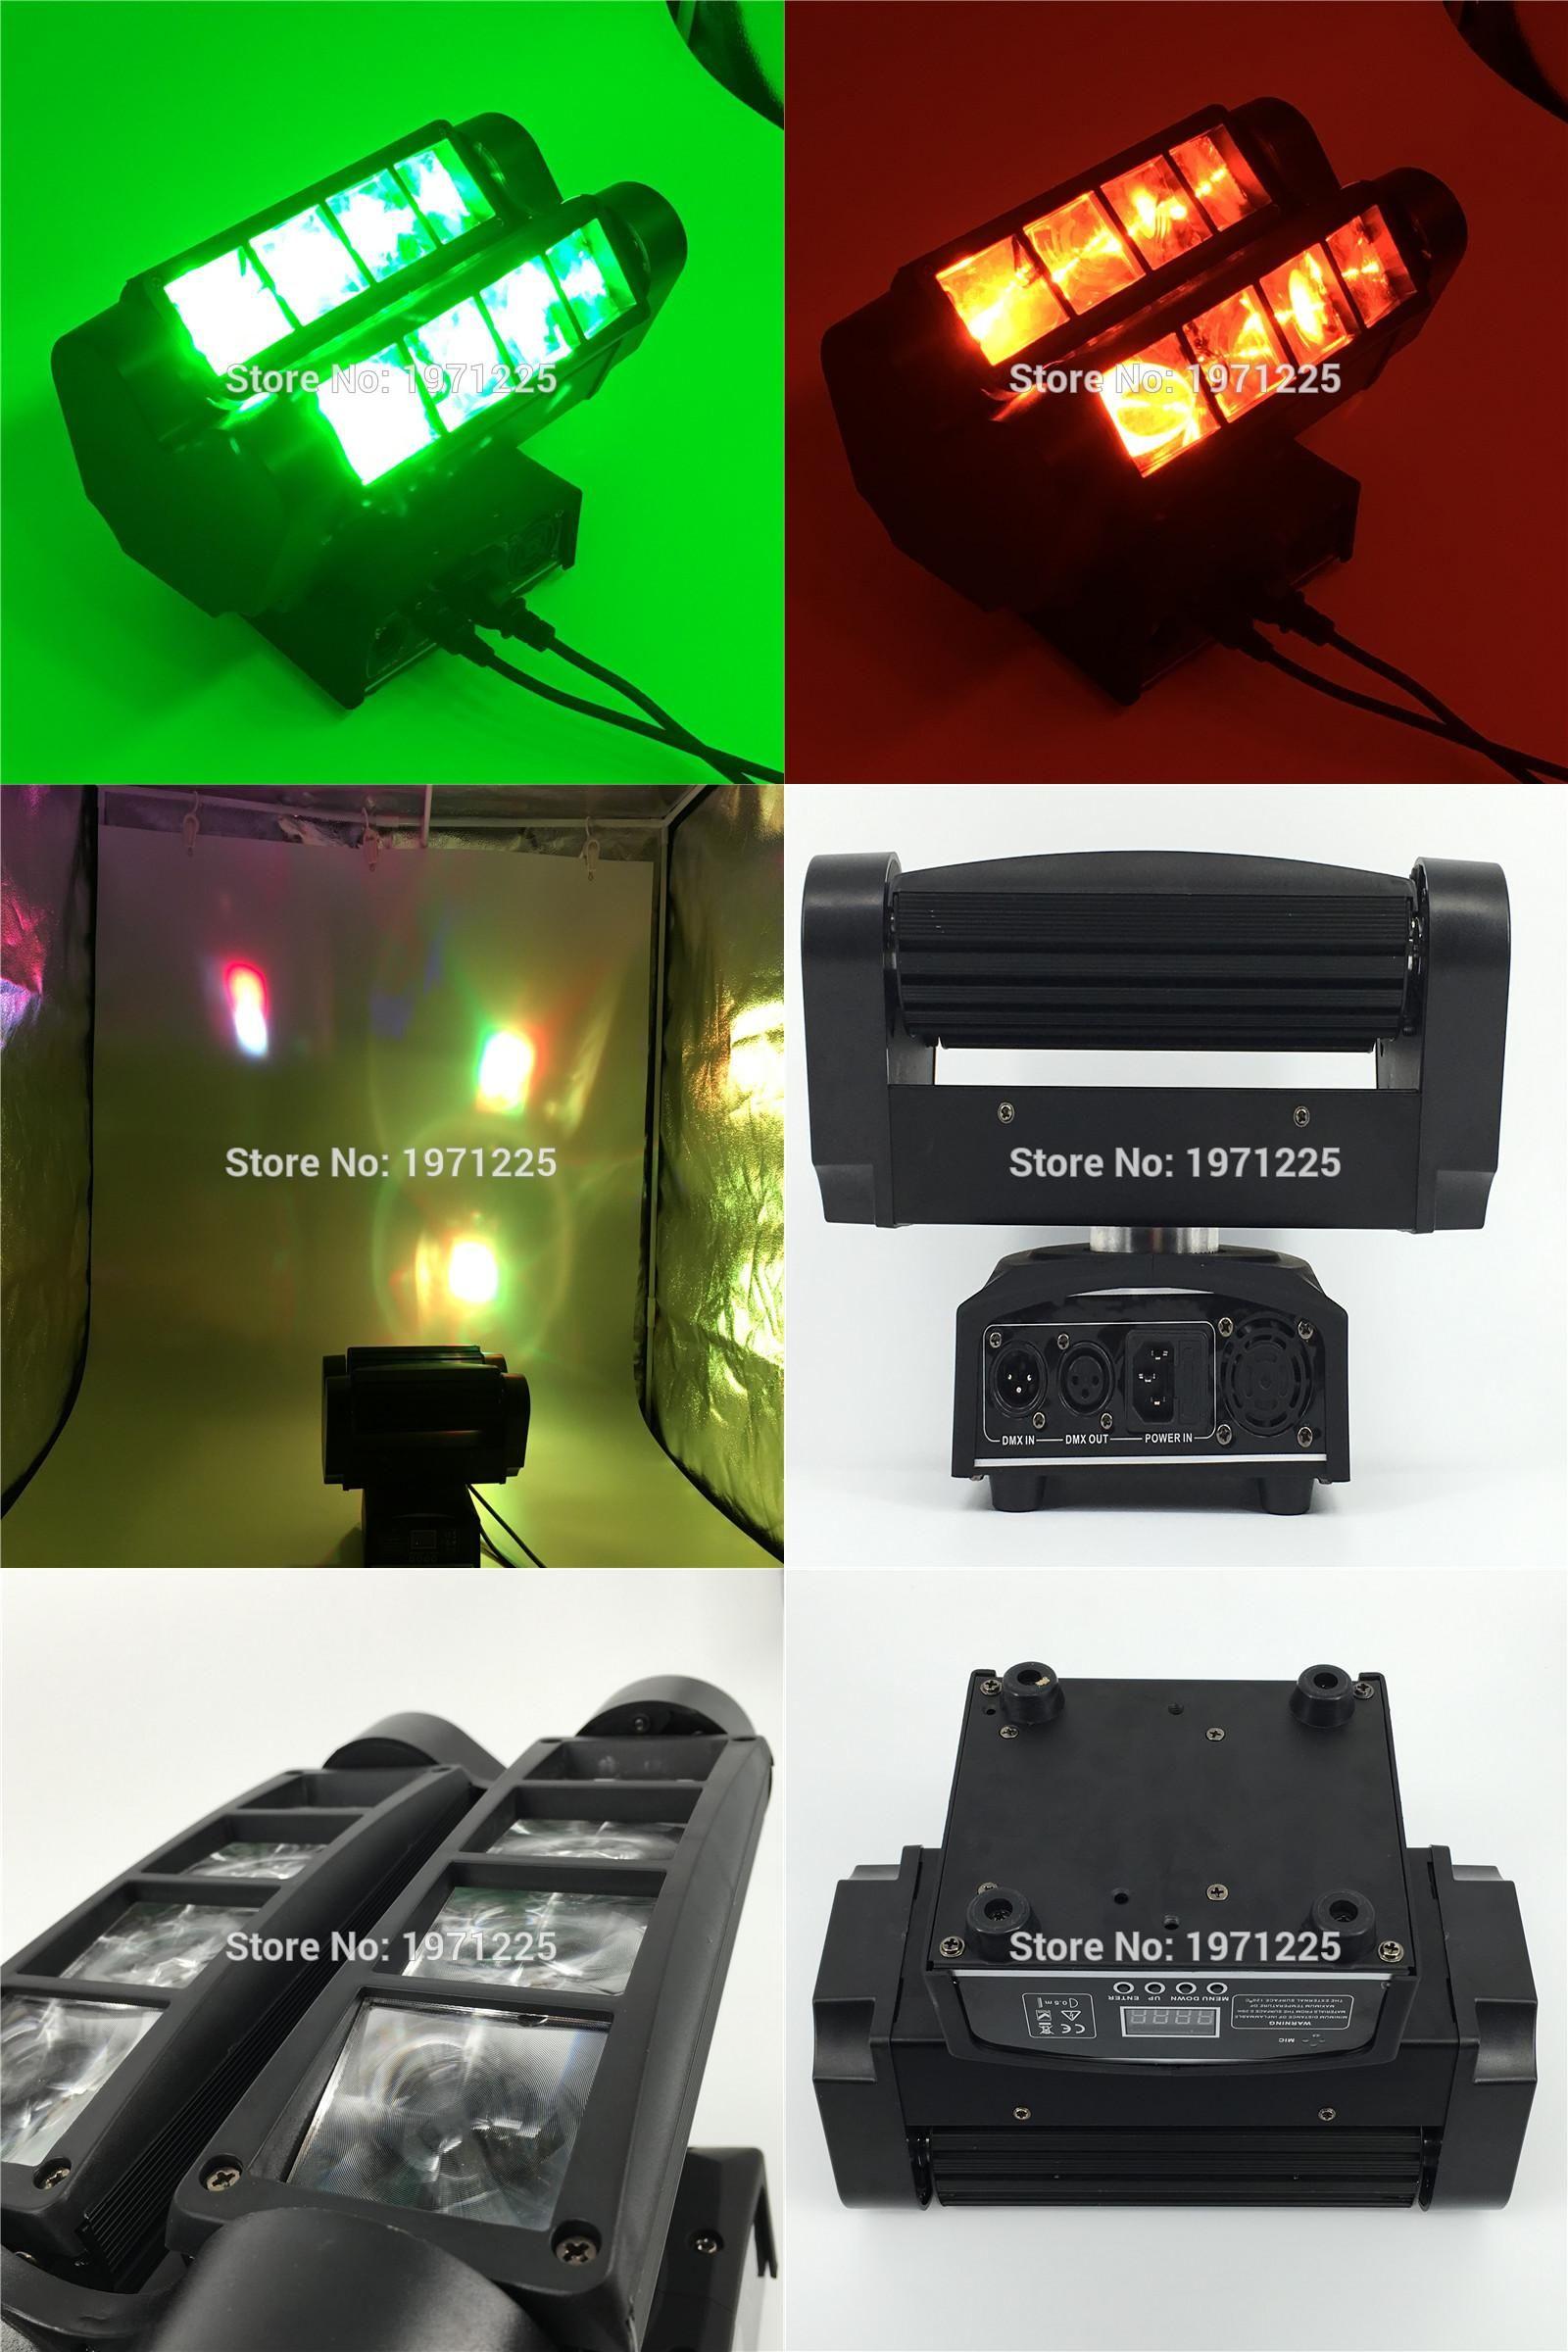 Visit To Buy 2pcs Mini Led Spider 8x10w Beam Moving Head Light Dmx Stage Christmas Light Dmx Dj Disco Stage Party Li Party Lights Dj Disco Christmas Lights